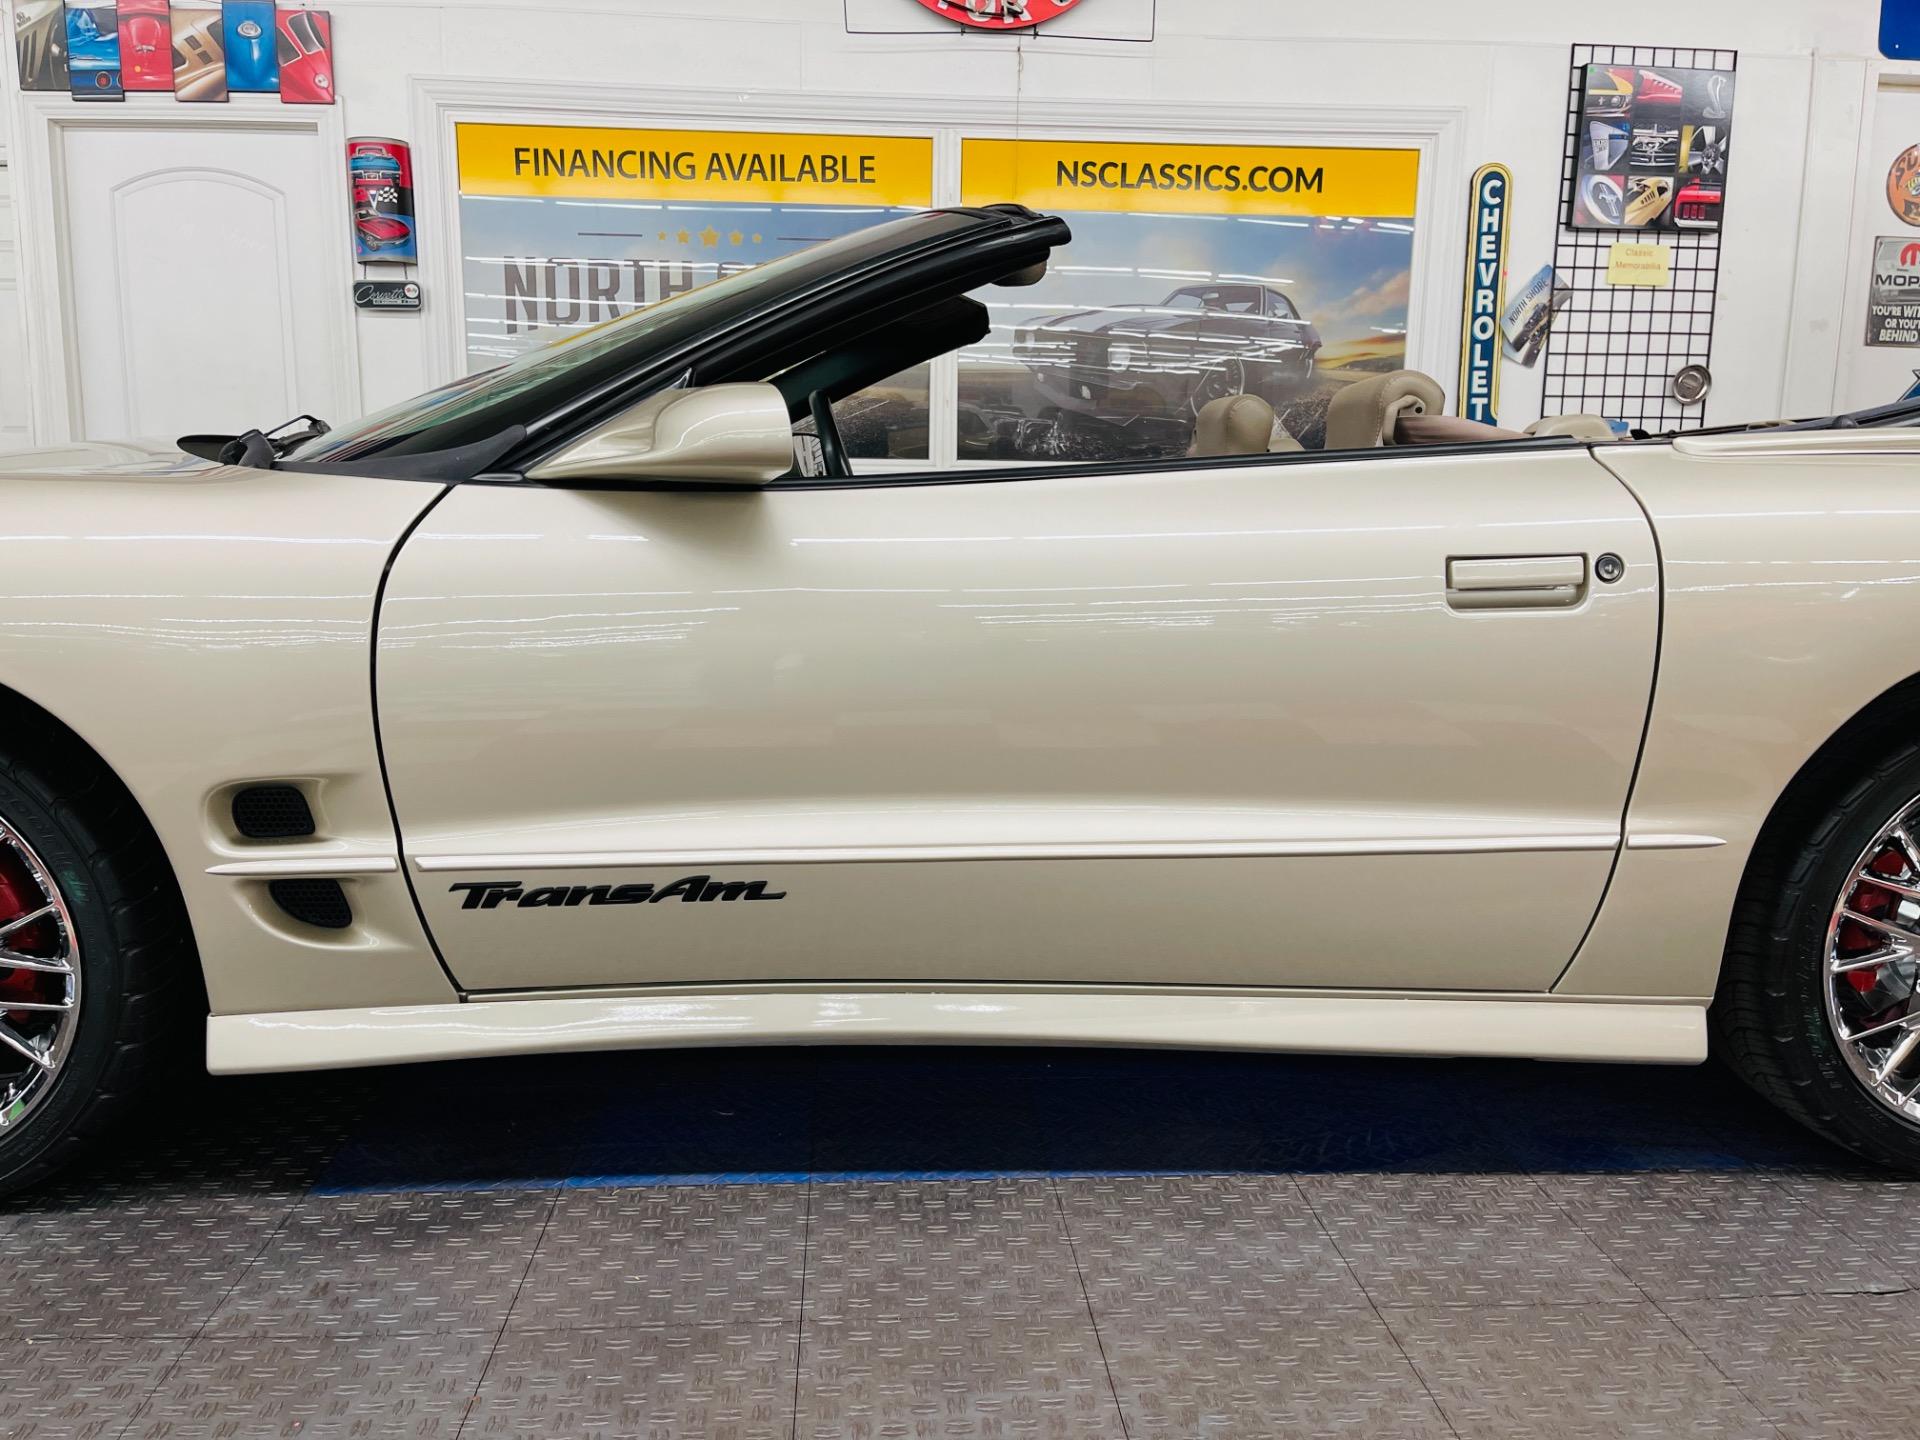 Used 2002 Pontiac Firebird - TRANS AM - CONVERTIBLE - NEW PAINT - SEE VIDEO | Mundelein, IL